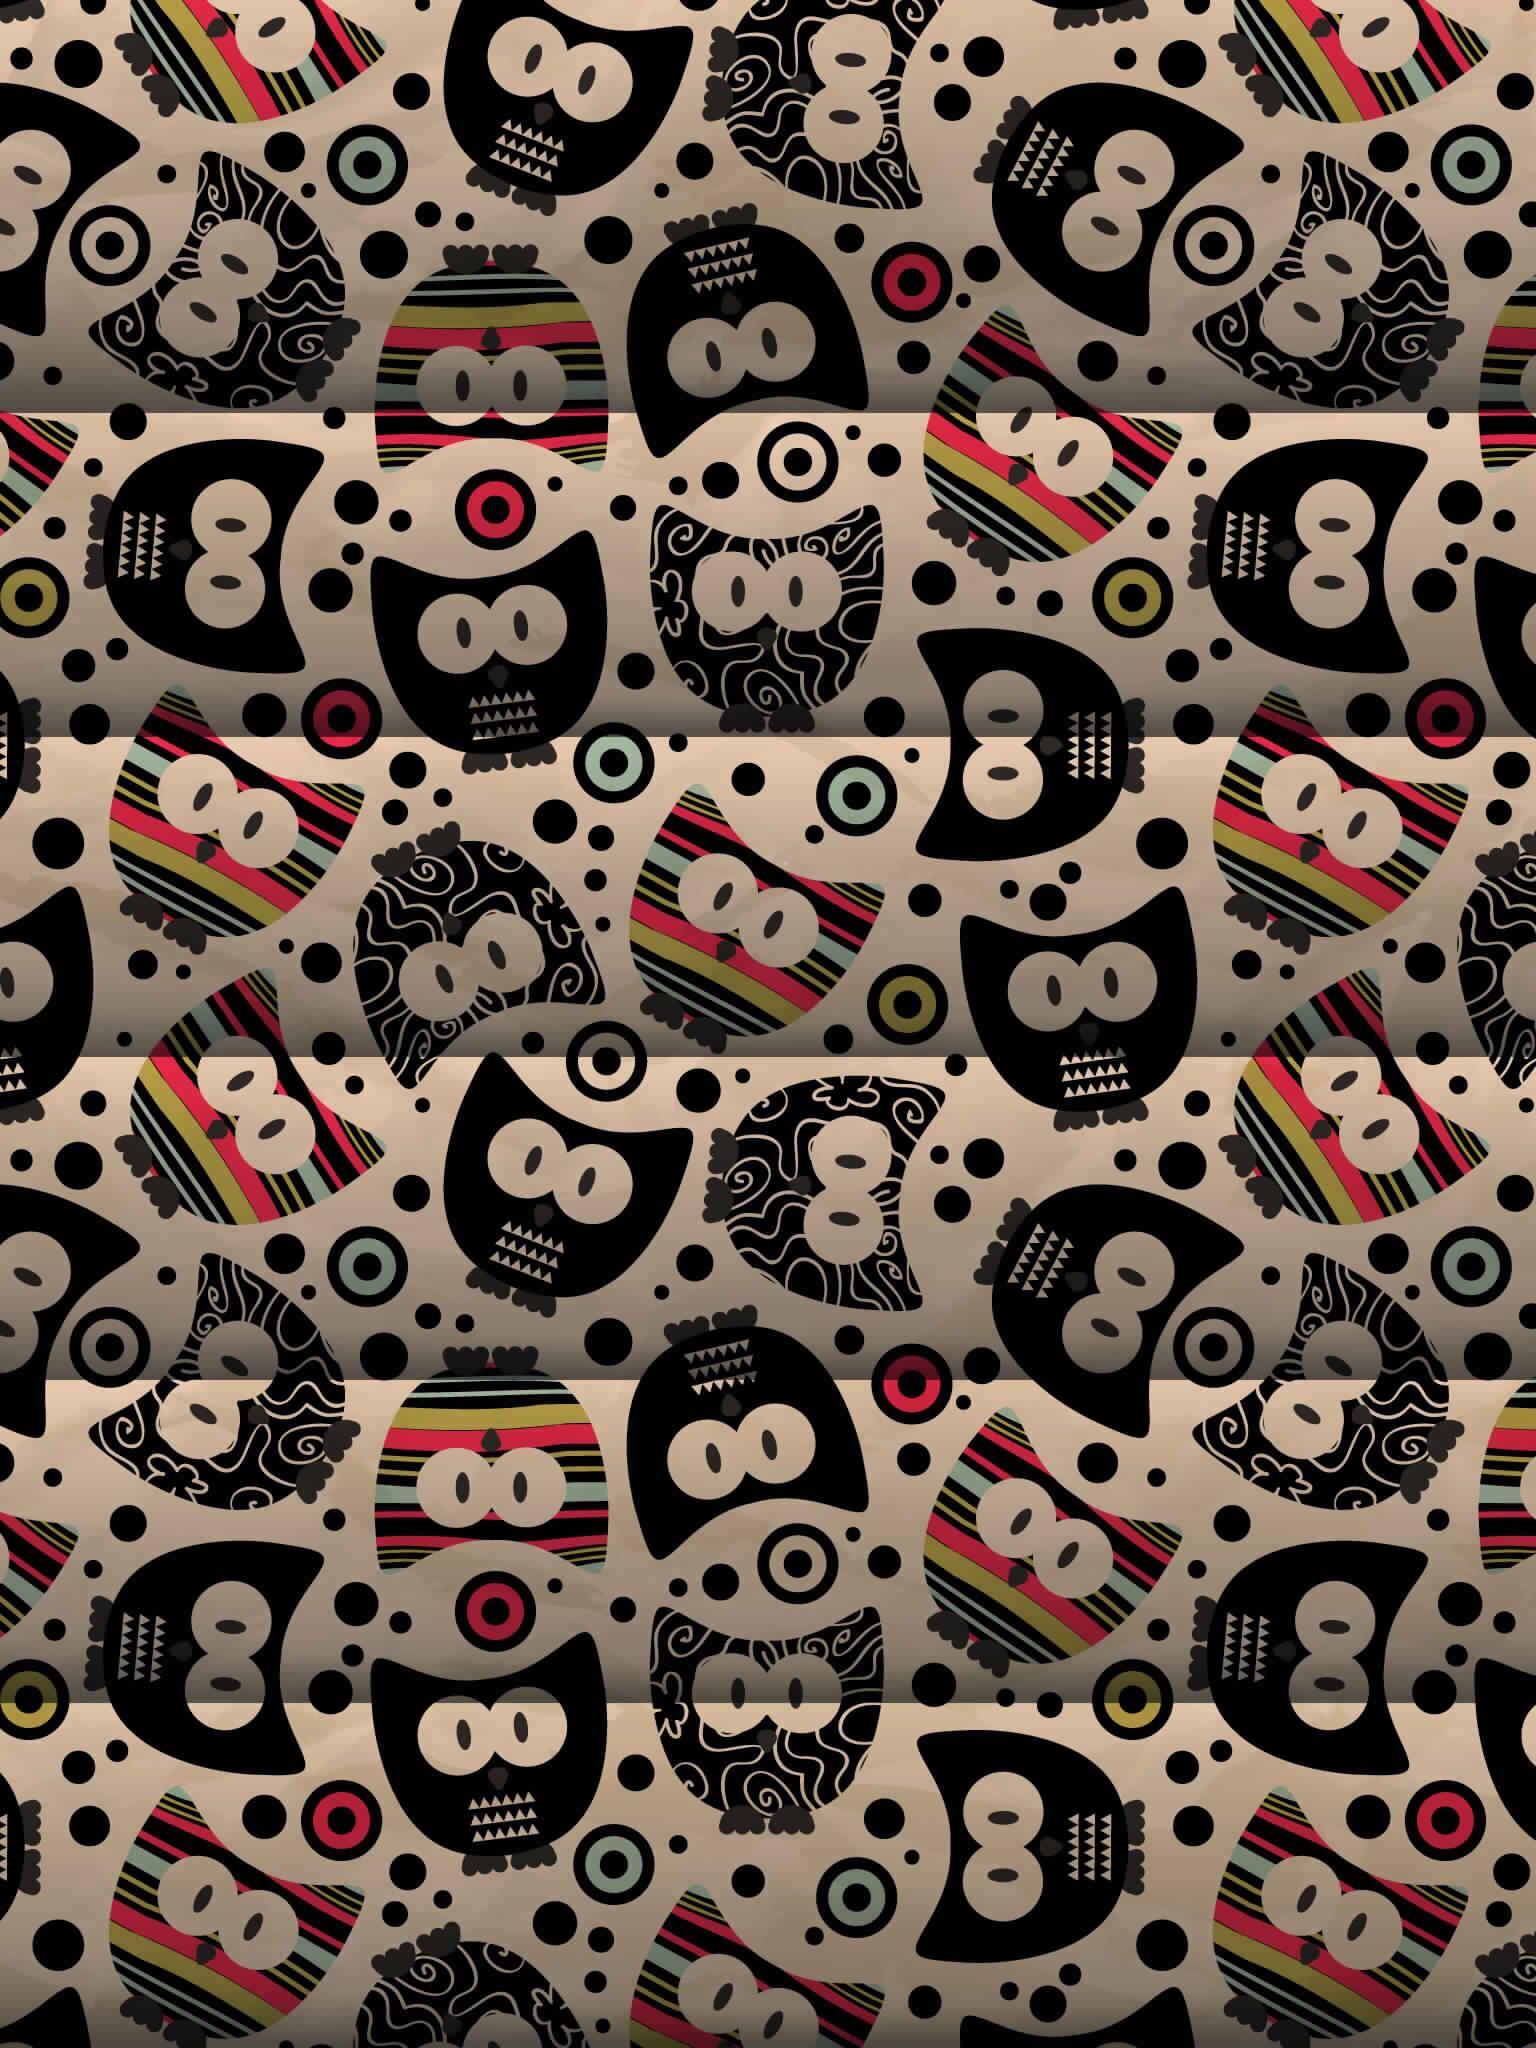 Wallpaper APP SHELVES Iphone wallpaper quotes love, Owl